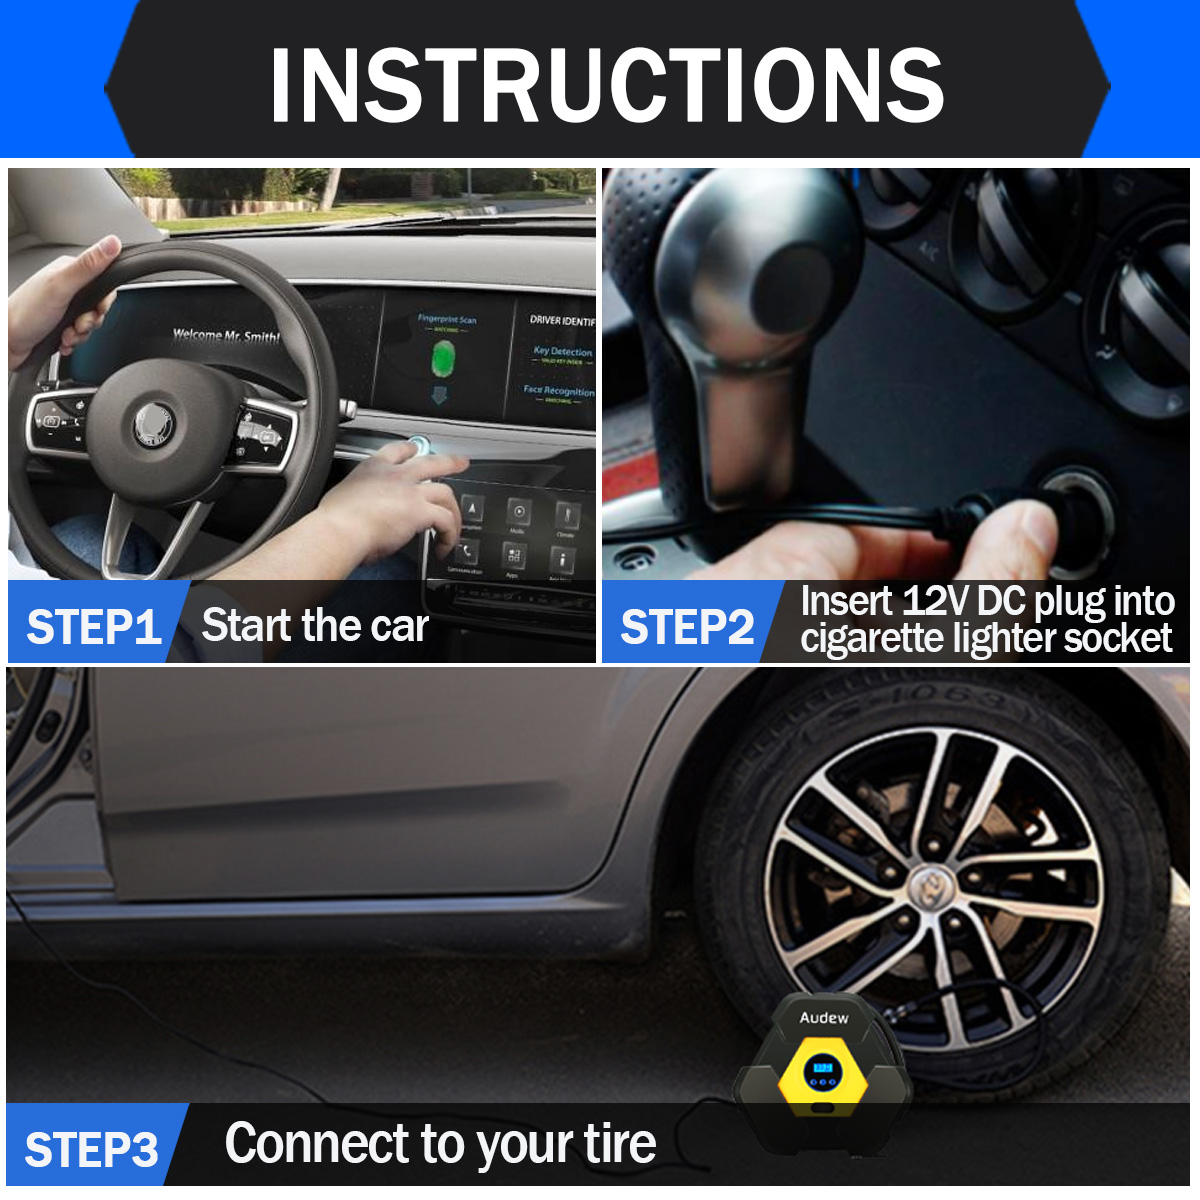 Audew Auto Digital Tire Inflator 12v Portable Tire Pump